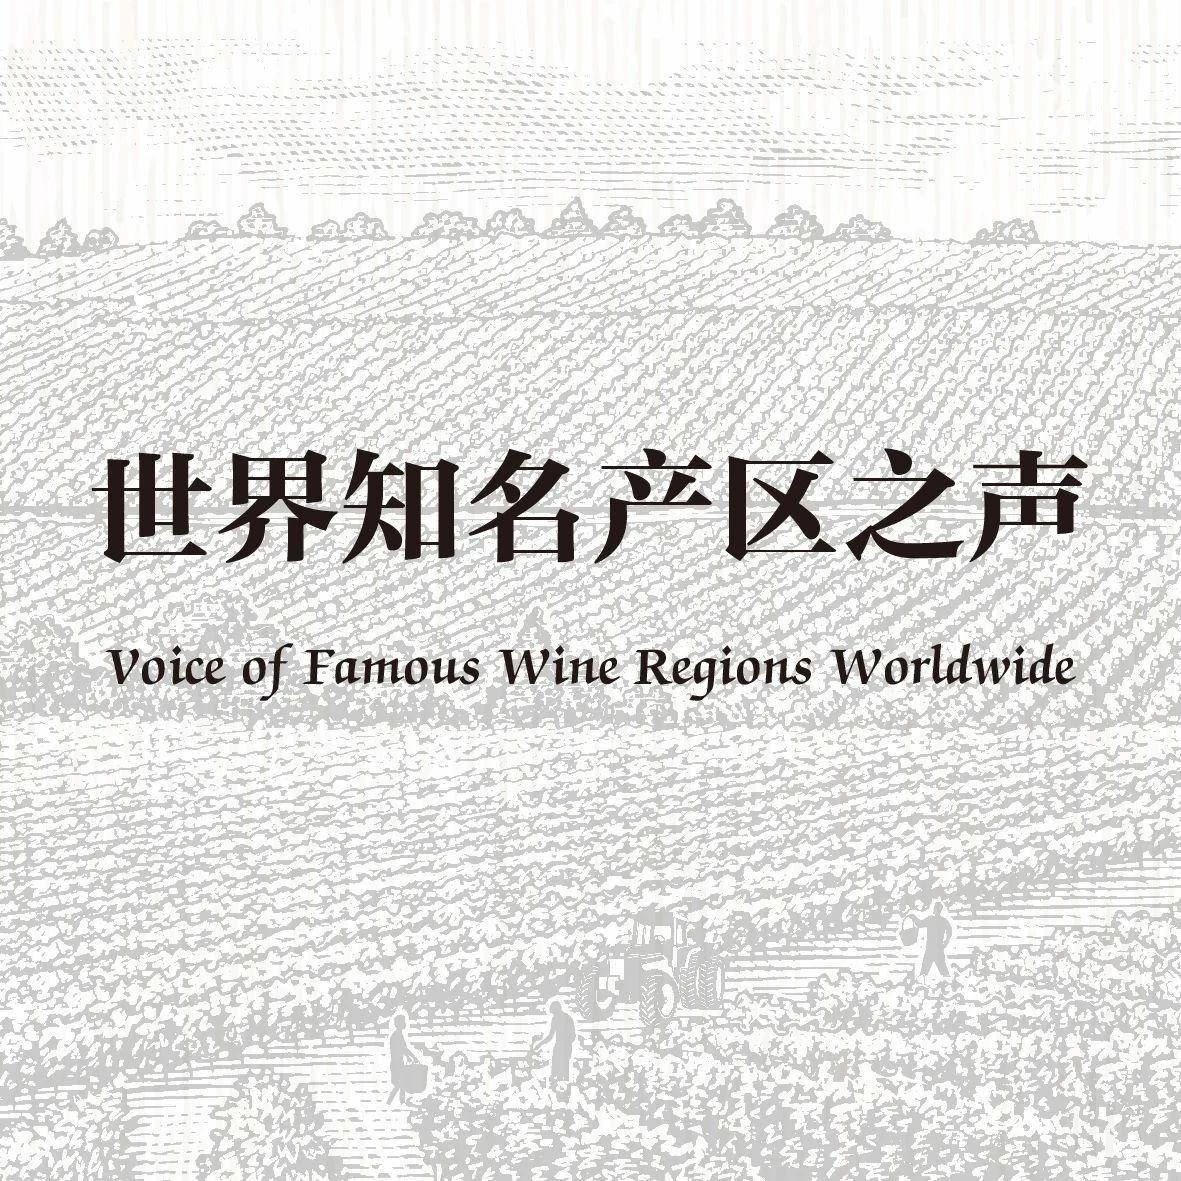 Manuela Liebchen:德国葡萄酒出口中国金额十年翻一倍,未来白葡萄酒上升空间更大丨世界知名产区之声④